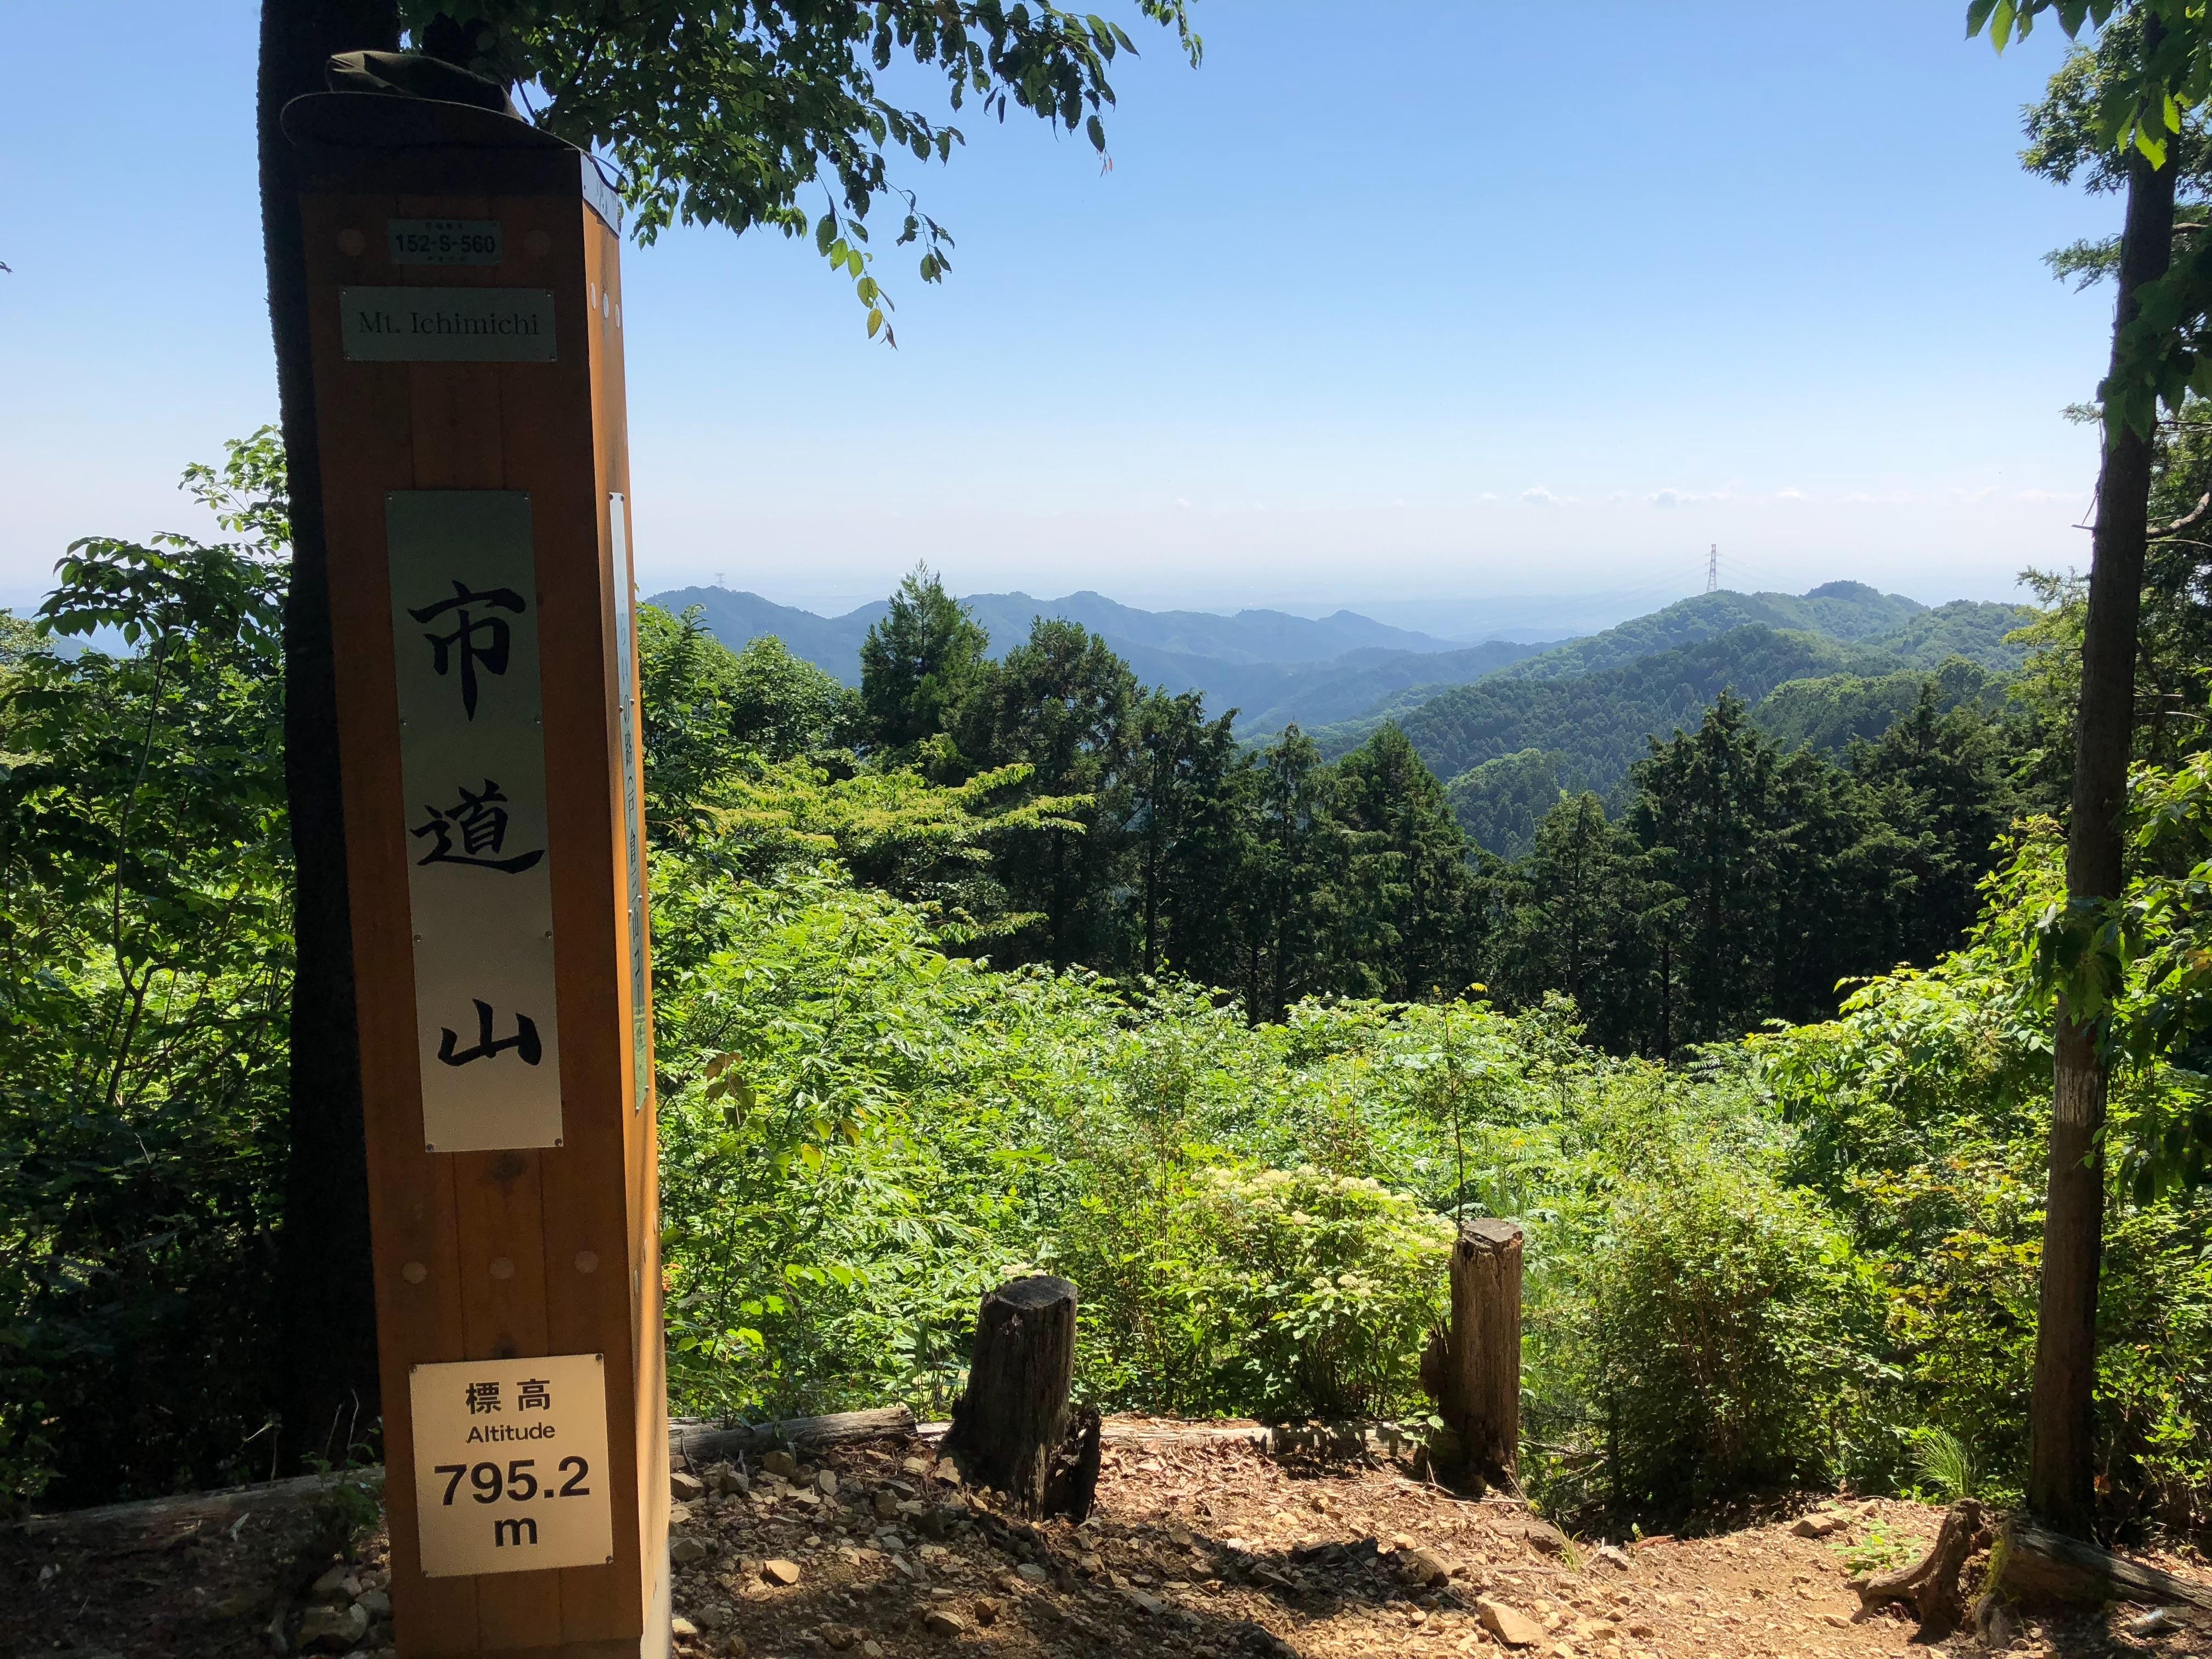 f:id:yanakahachisuke:20180605003527j:image